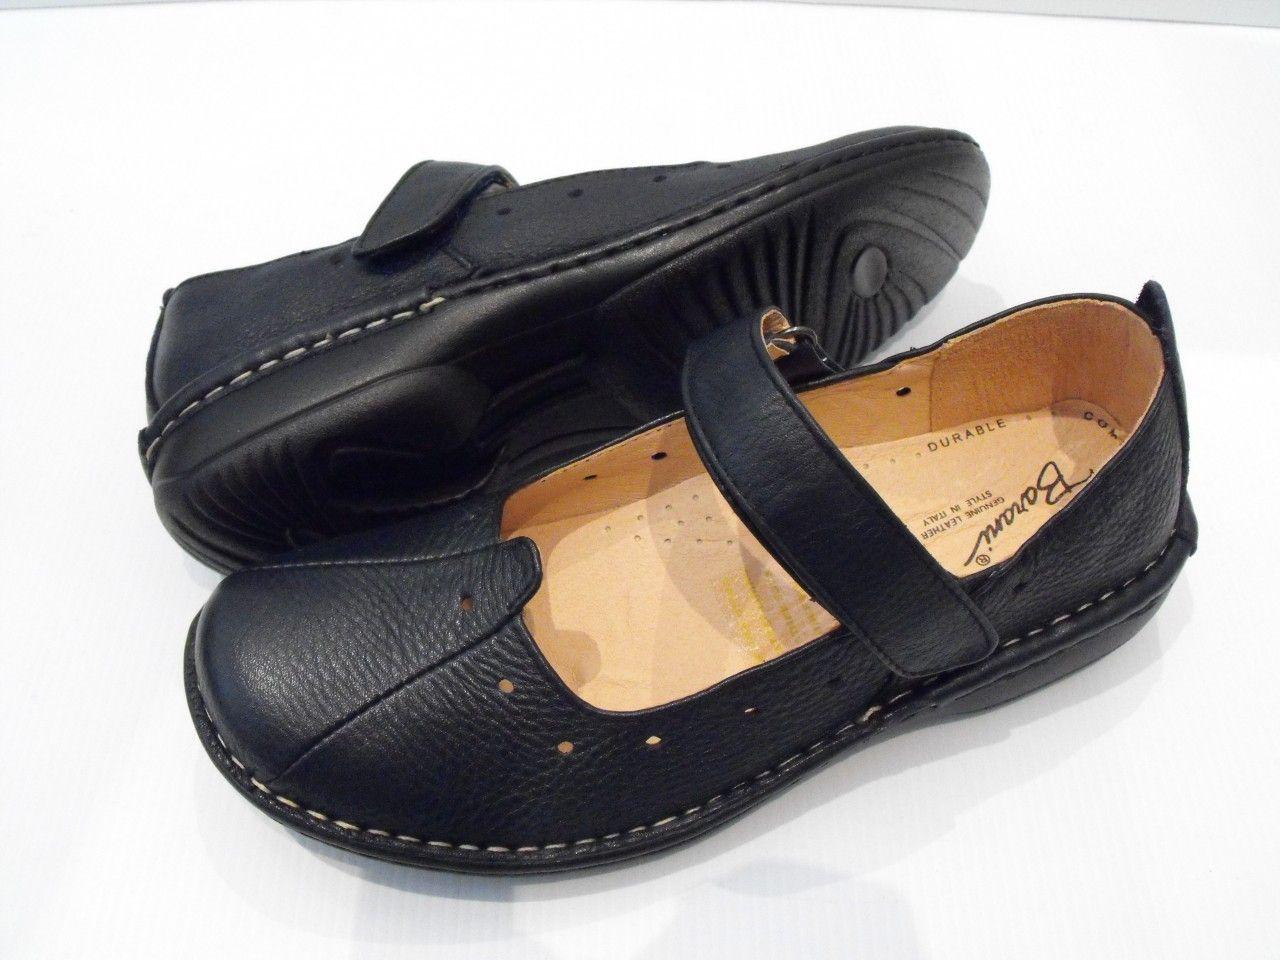 Cooperative Dansko Black Leather Clogs Womens Size 37 Fancy Colours Women's Shoes